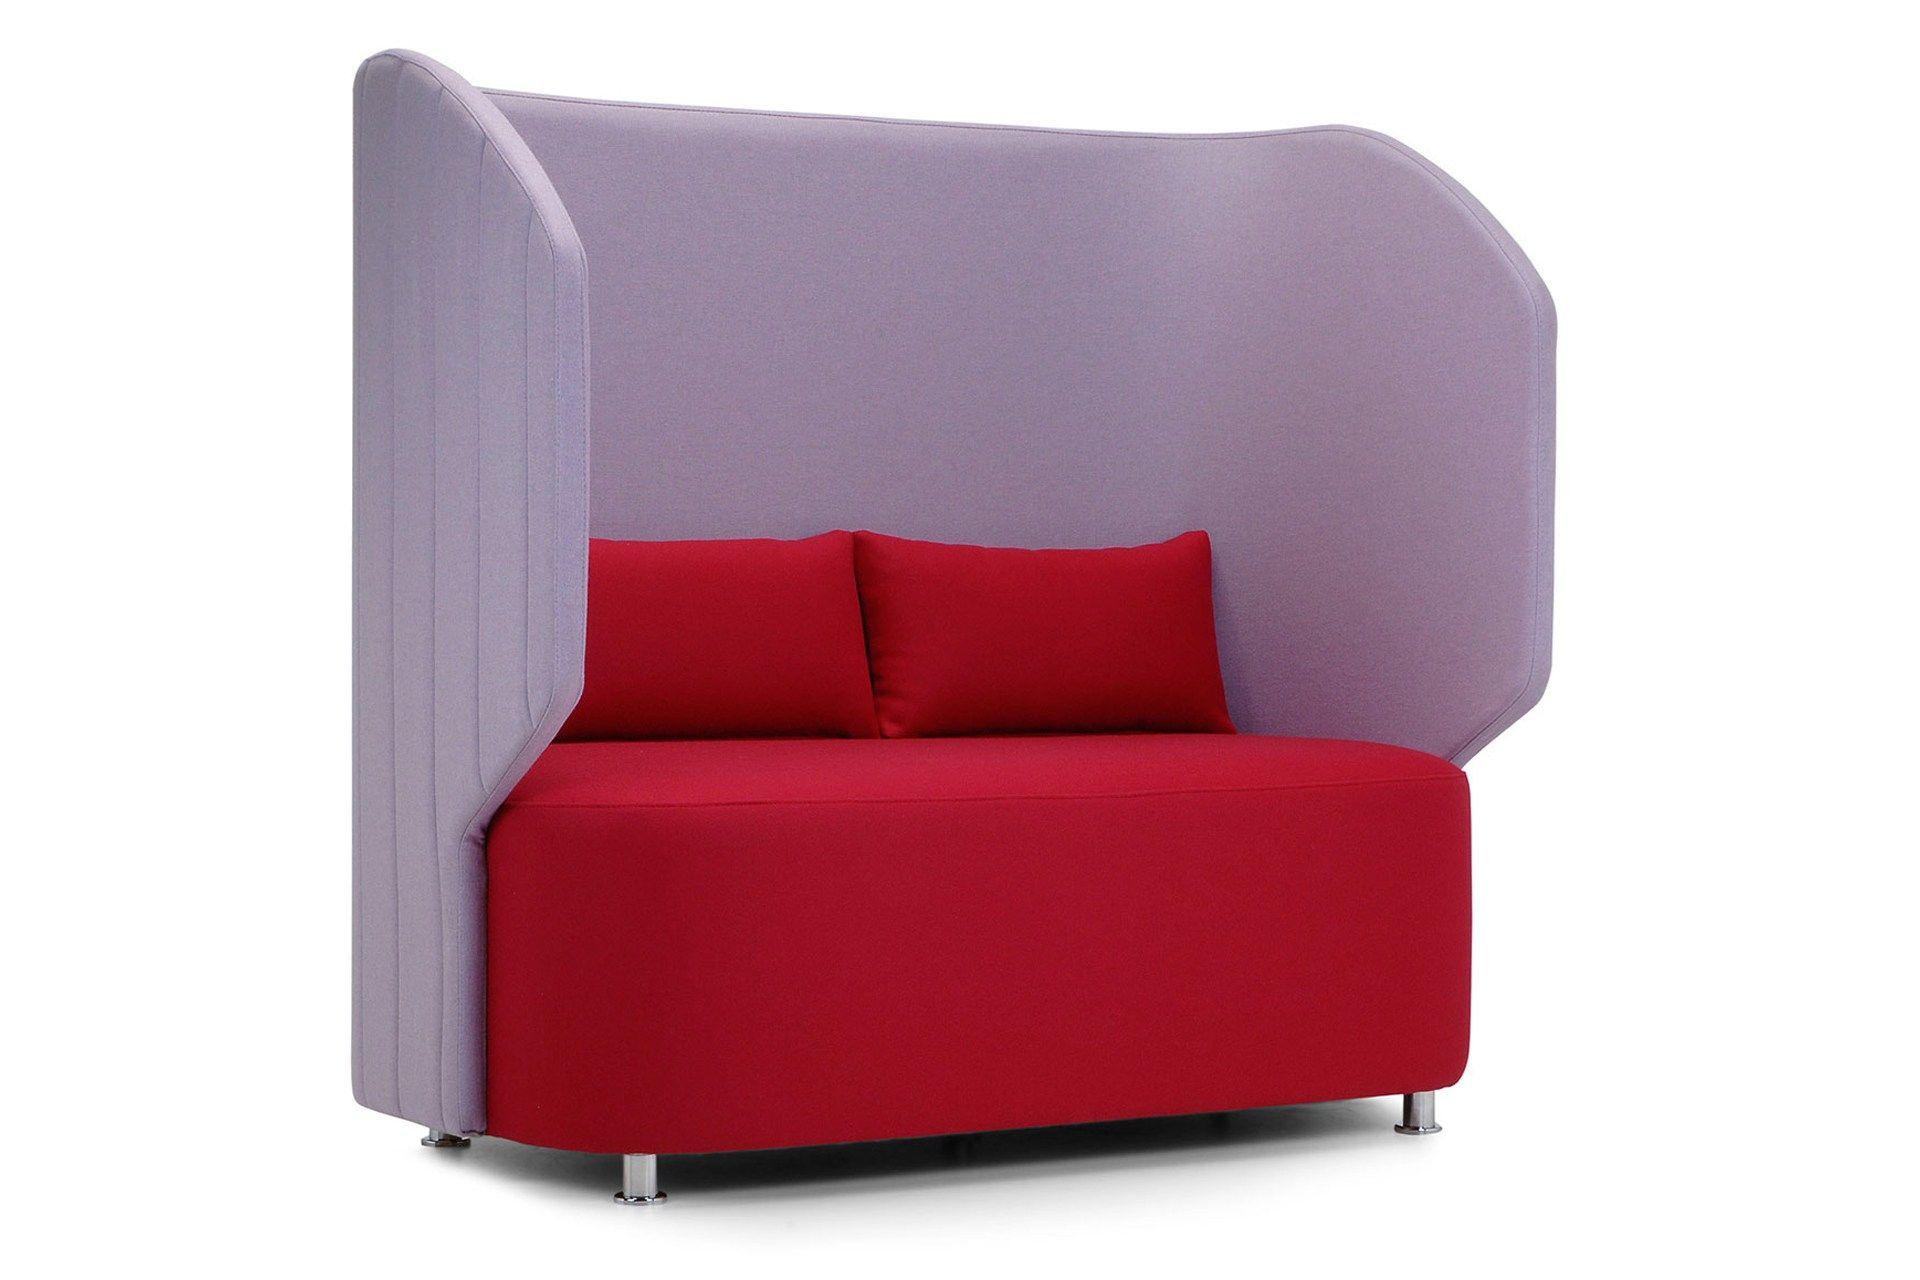 MAJI | High-back sofa Maji Collection By Adrenalina design Setsu ...